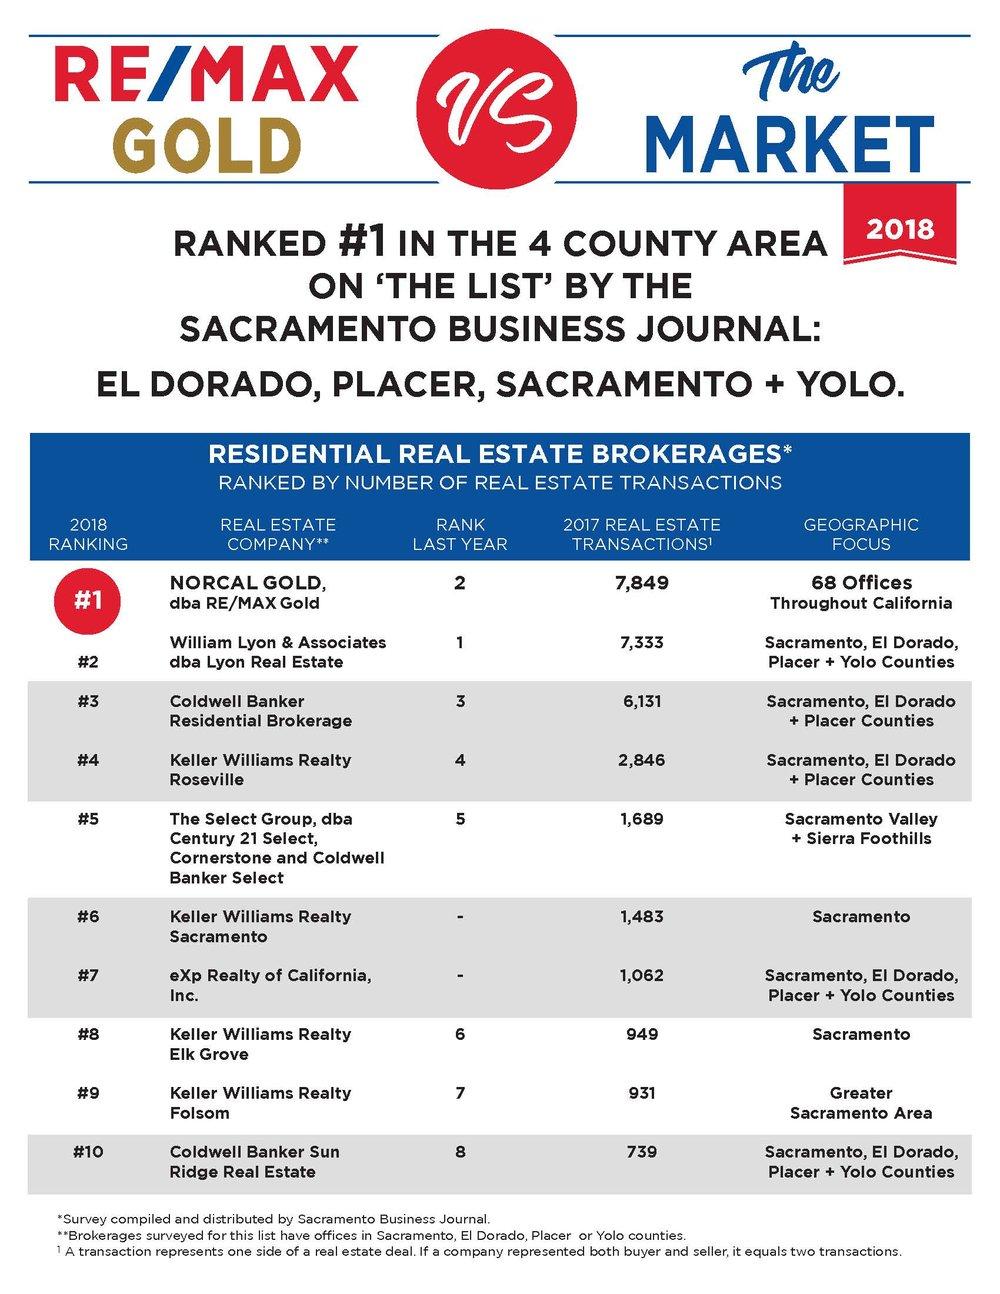 RMXG-VS-Industry-2018-Biz-Journal.jpg